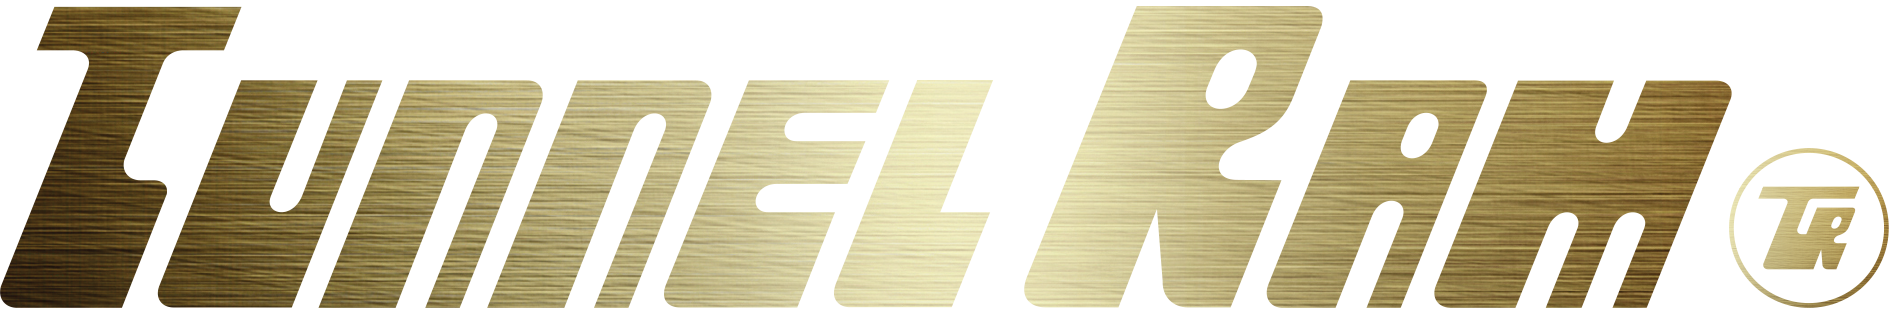 The Tunnel Ram Shop Logo